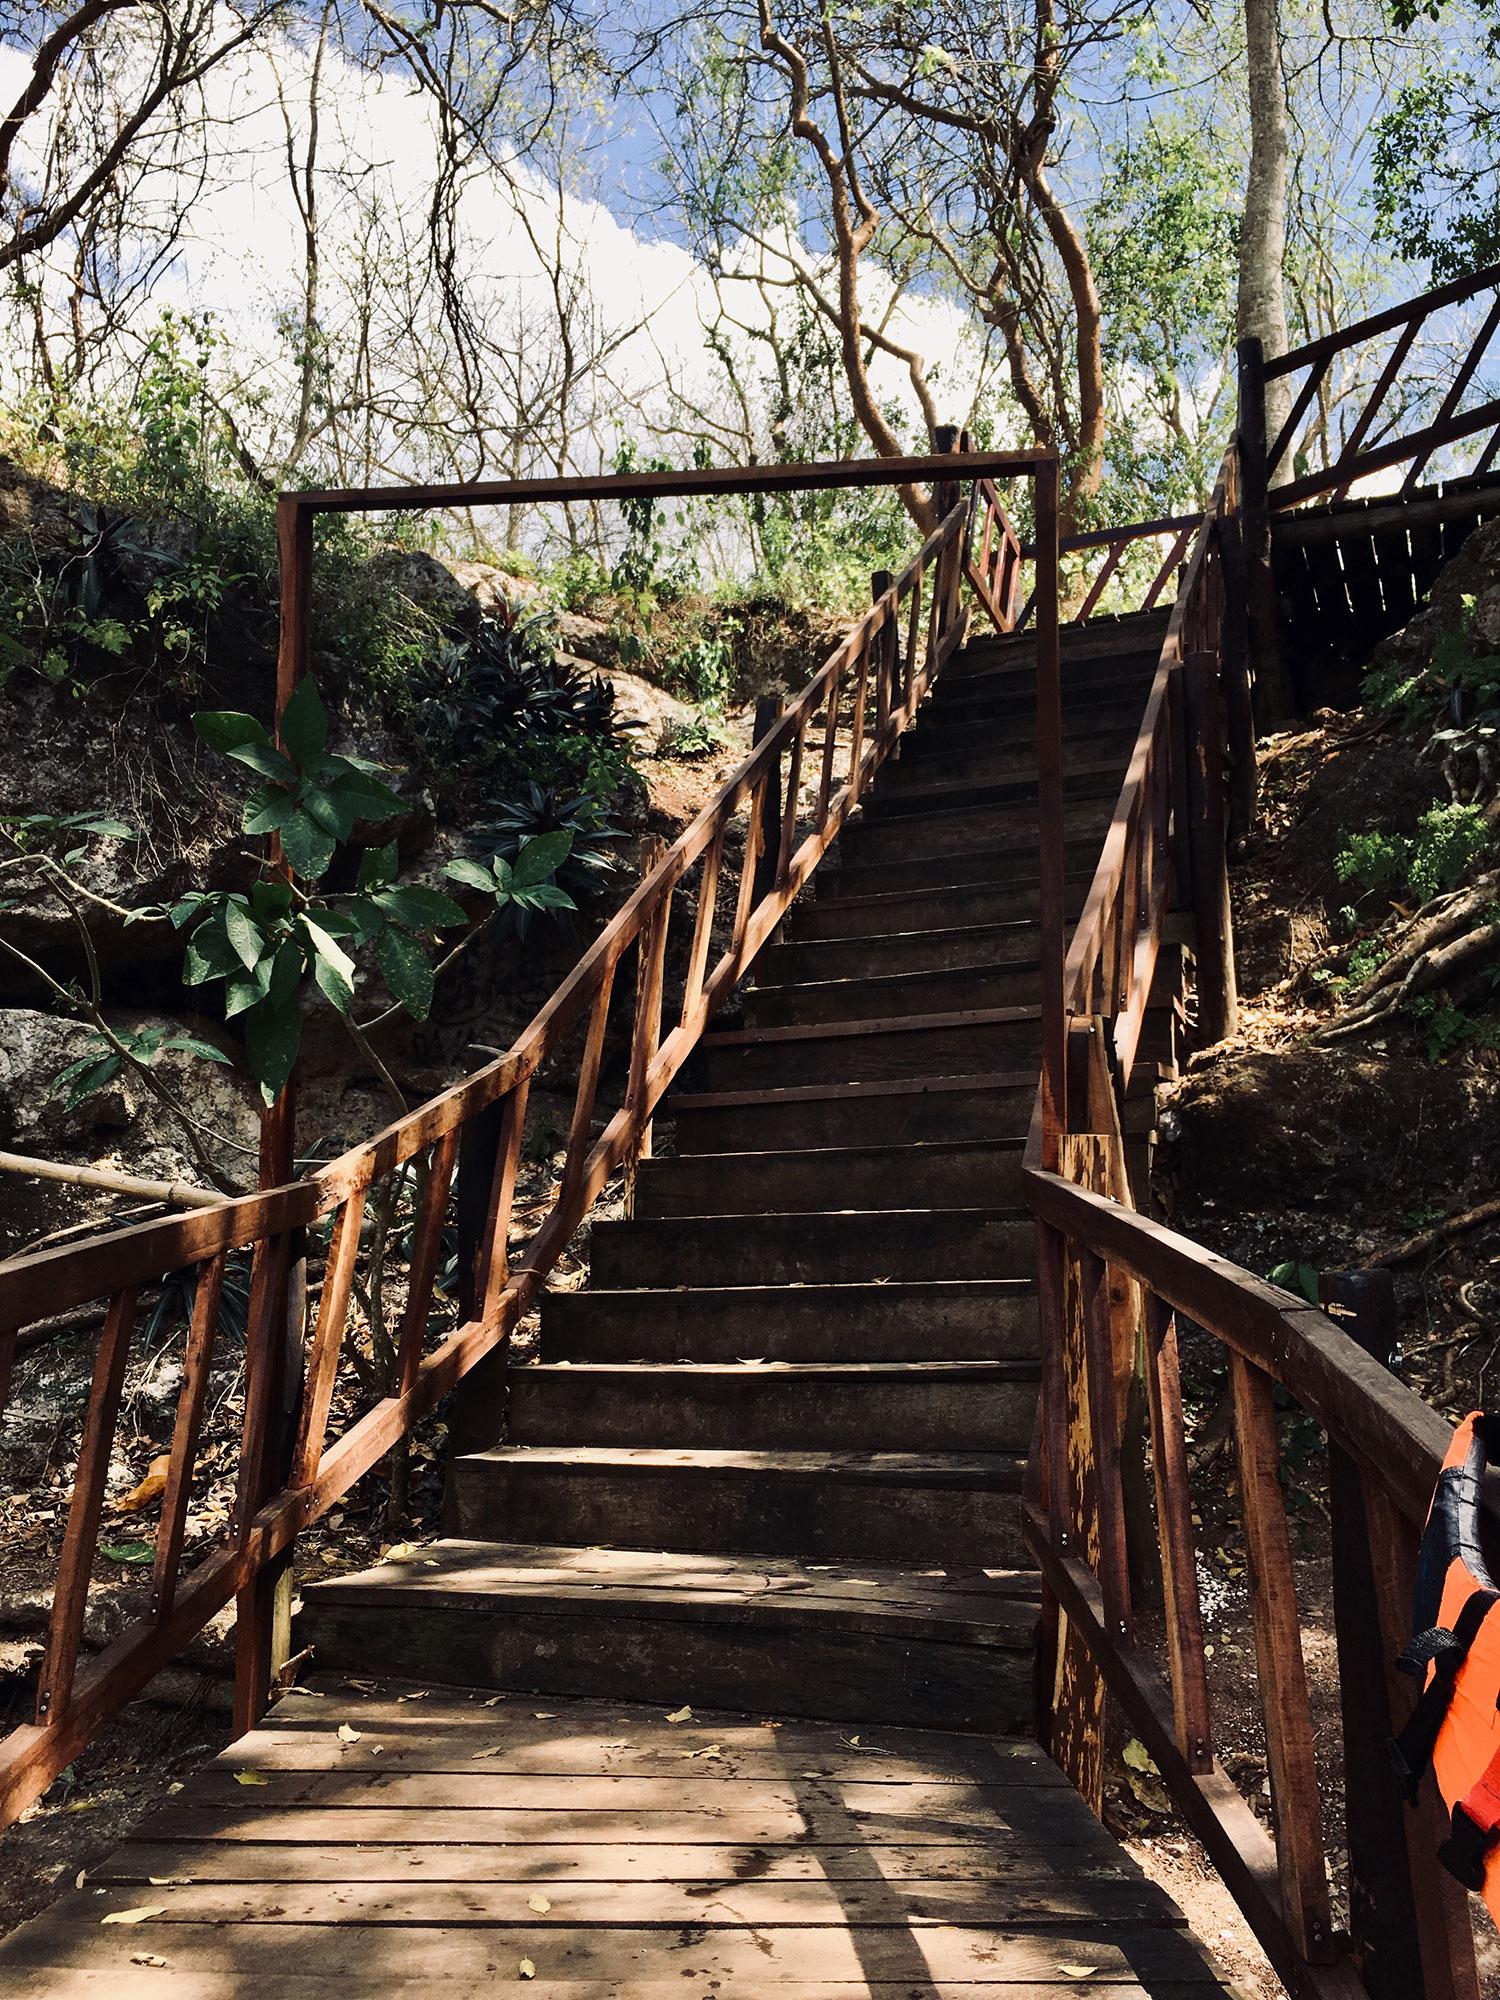 The steps to Boca 5.